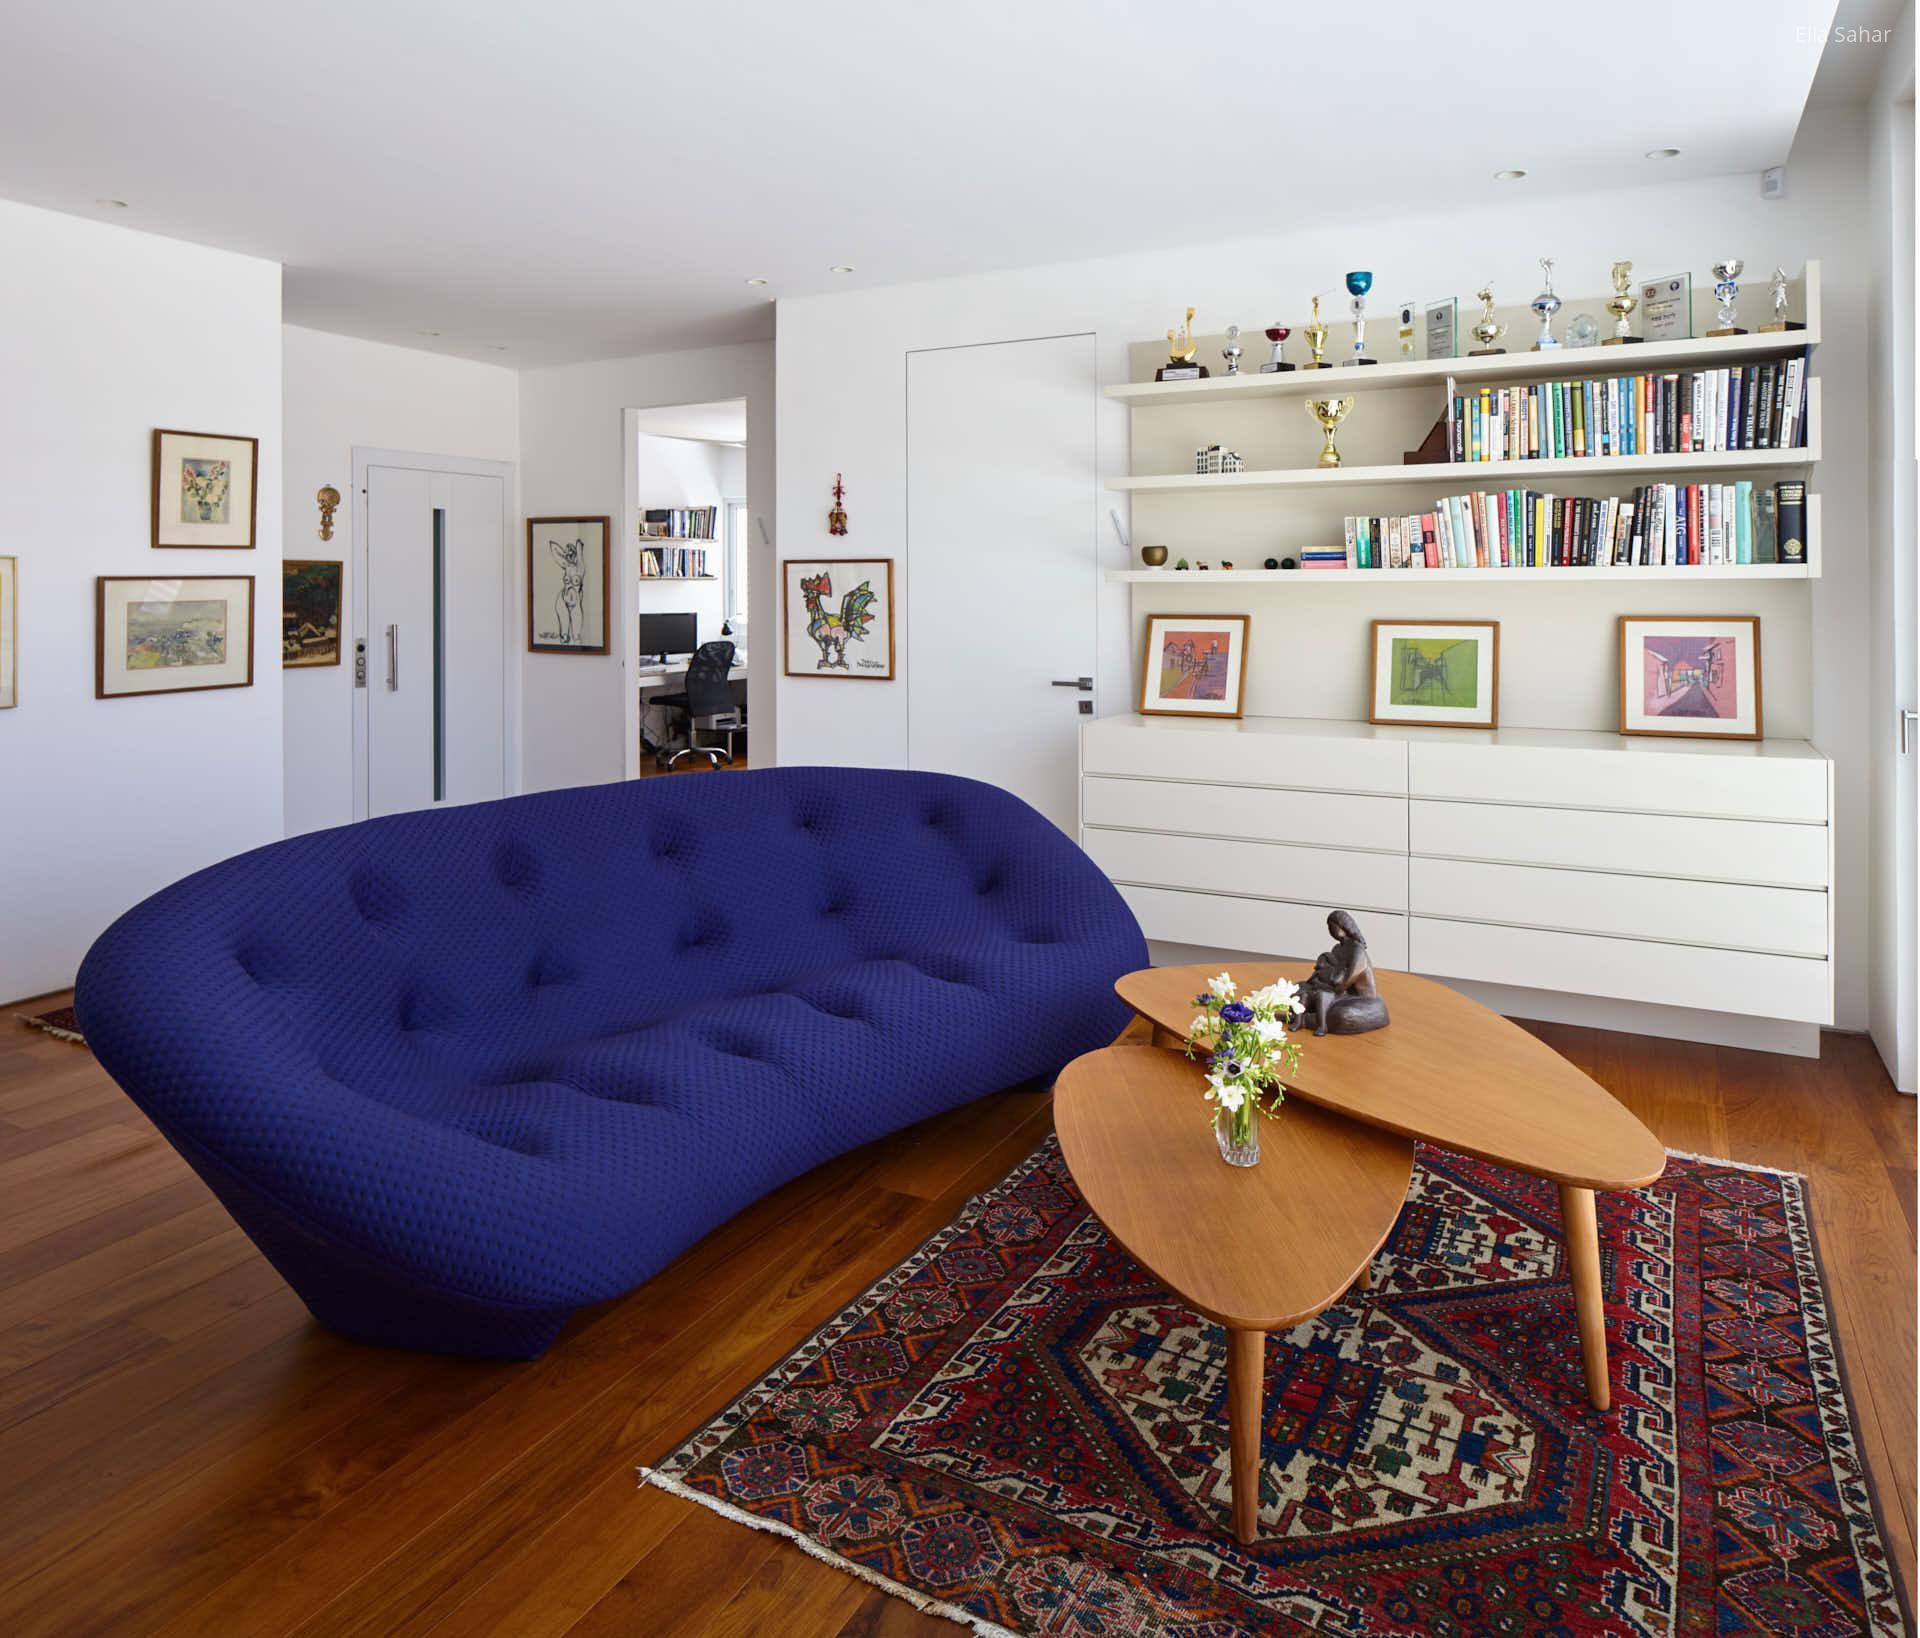 Kék design kanapé a nappaliban // HOMEINFO.hu - Inspirációtár